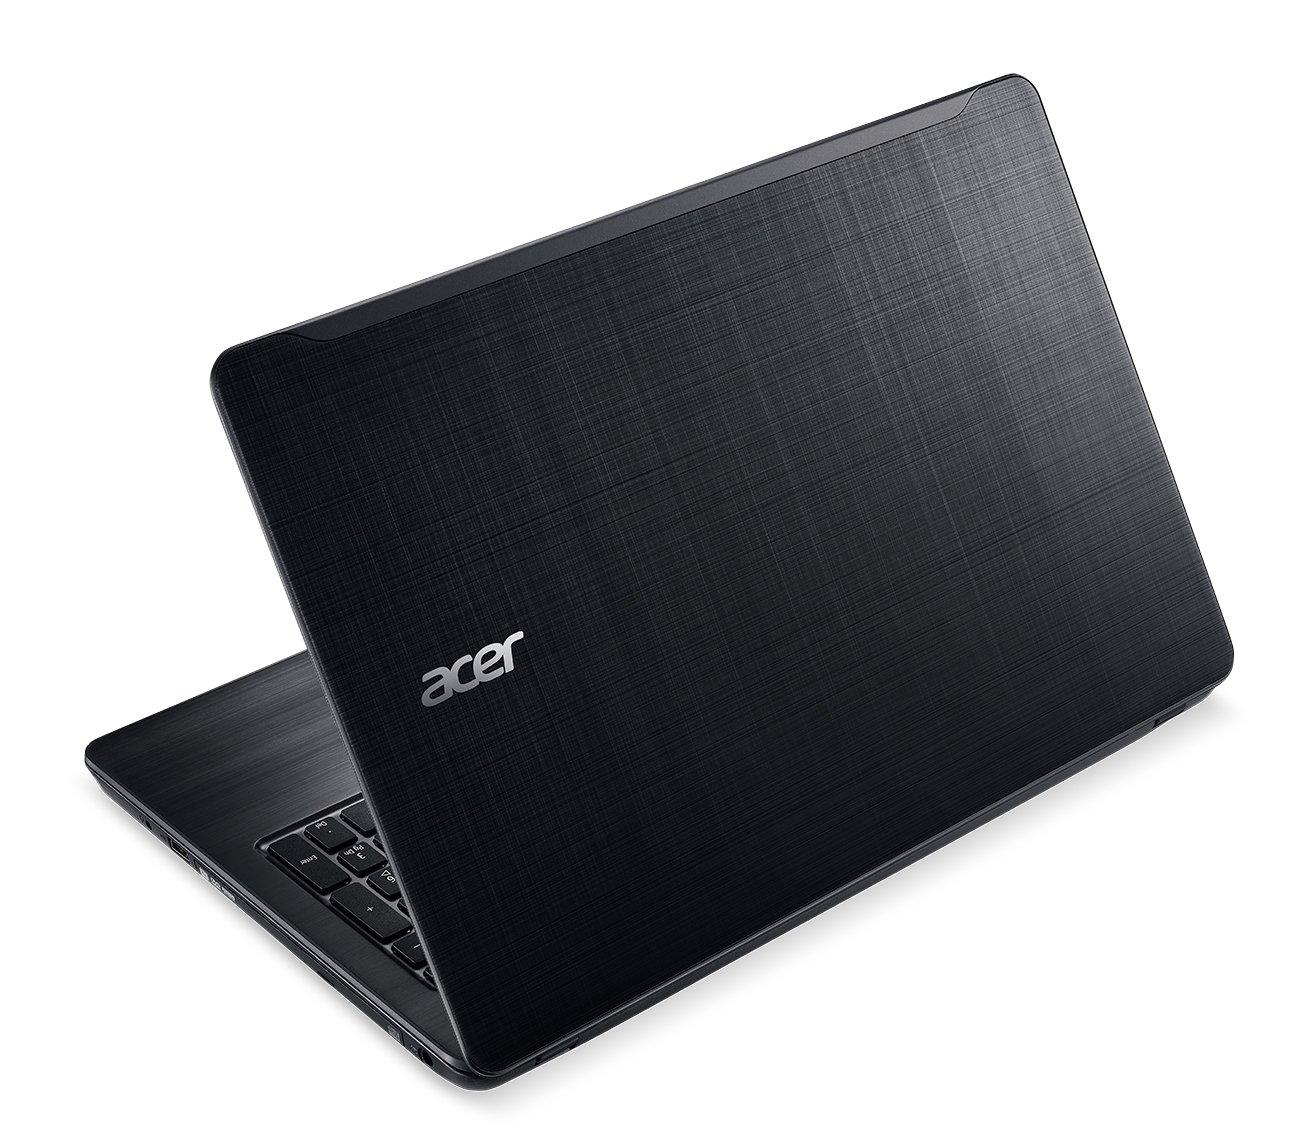 Acer Aspire F 15 156 Full Hd Intel Core I5 Nvidia E5 475g Notebook Grey 7200u 4gb Ddr4 Gt940mx 2gb Ddr5 1tb Hdd Dos 940mx 8gb Windows 10 Home F5 573g 56cg Computers Accessories